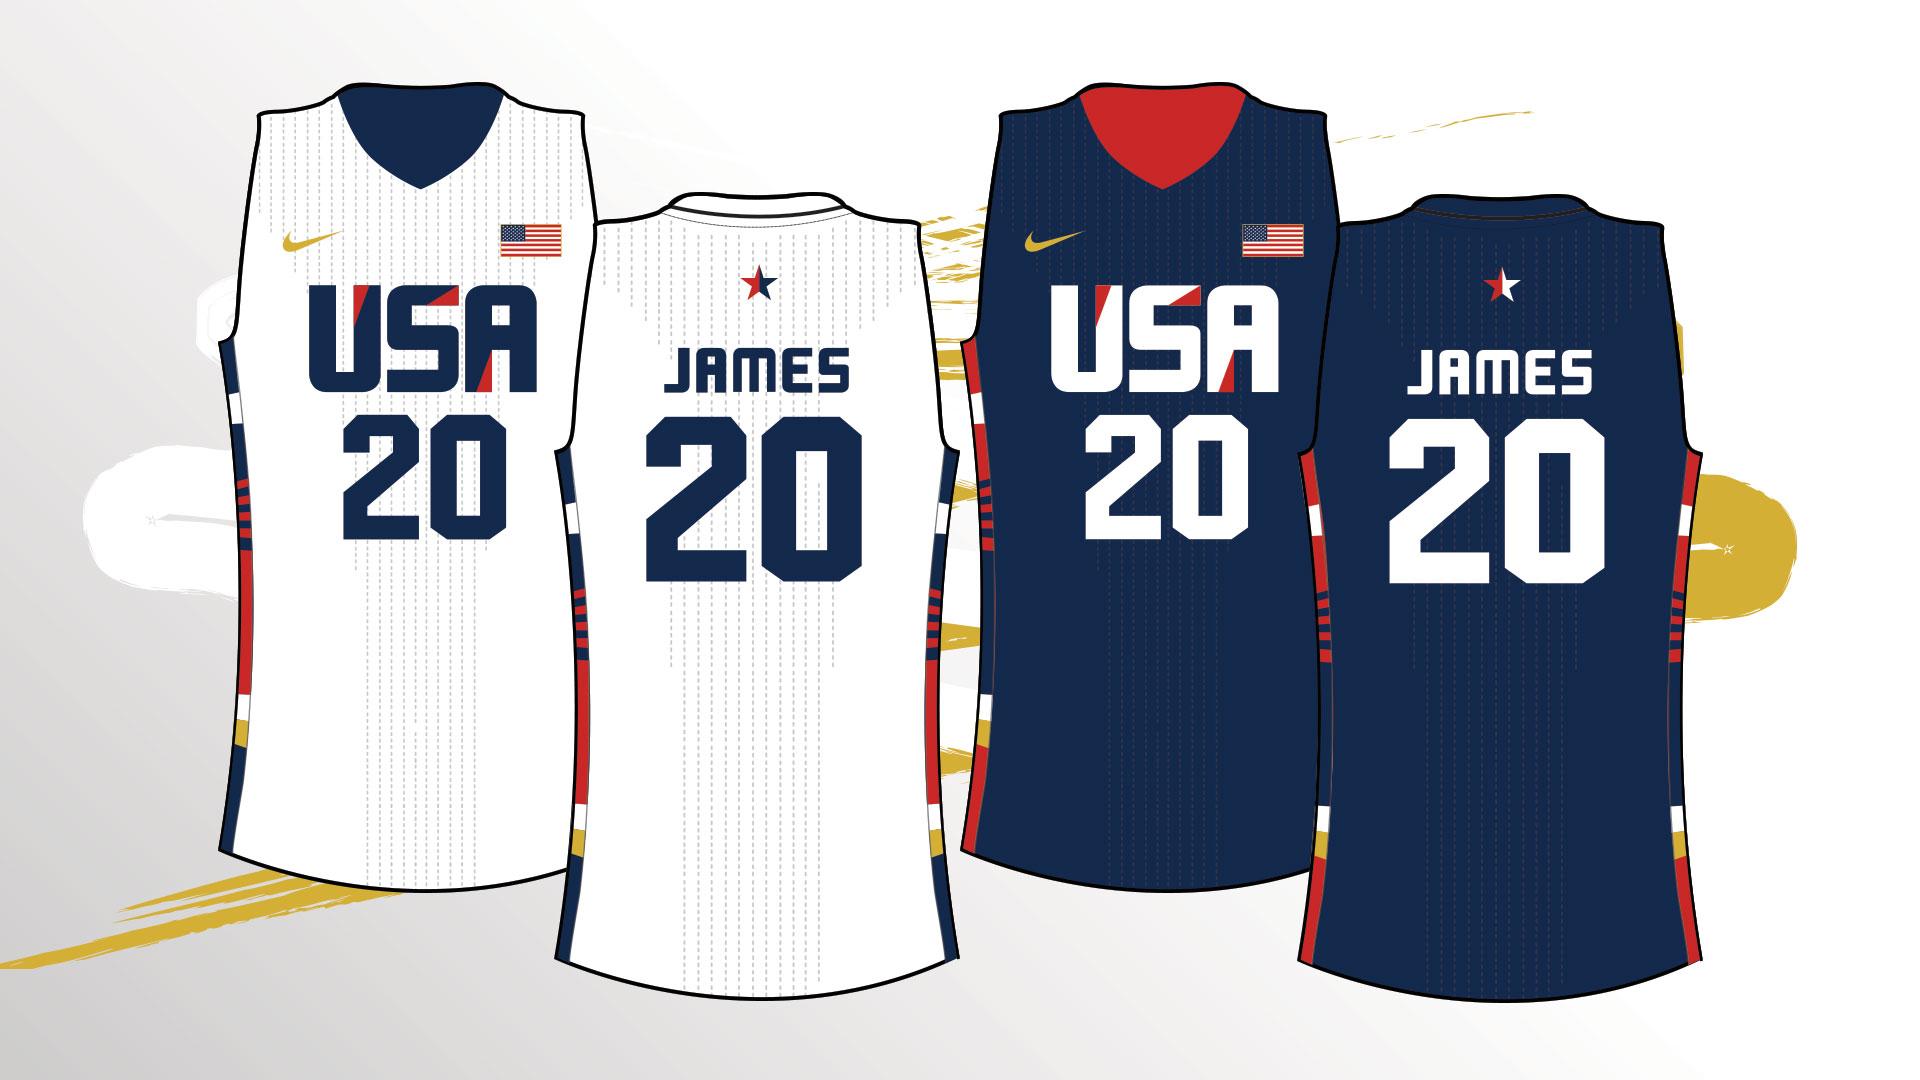 Image: 2020 Team USA 04